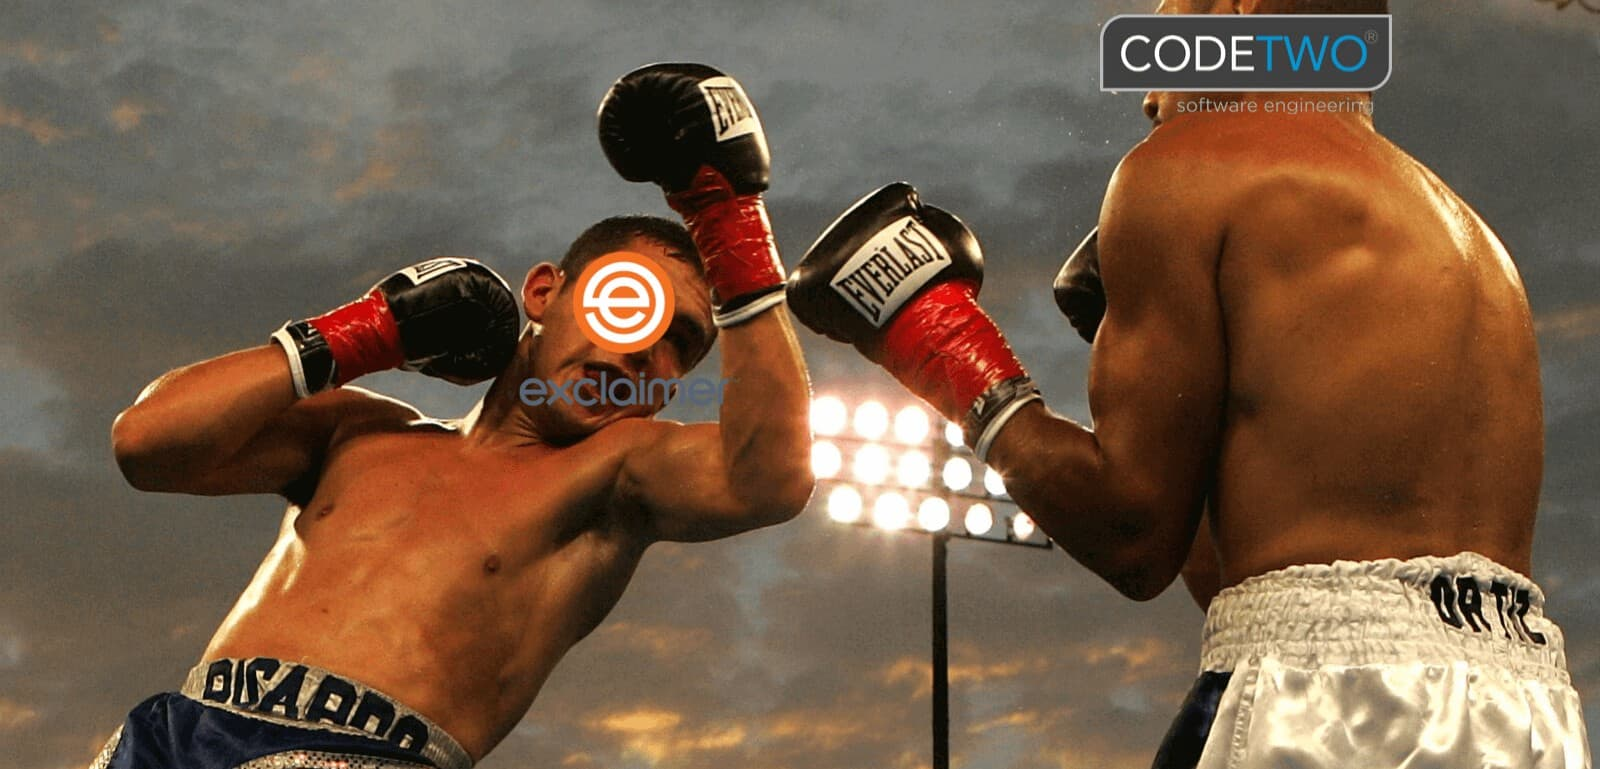 CodeTwo vs Exclaimer Signature Office 365 Comparison